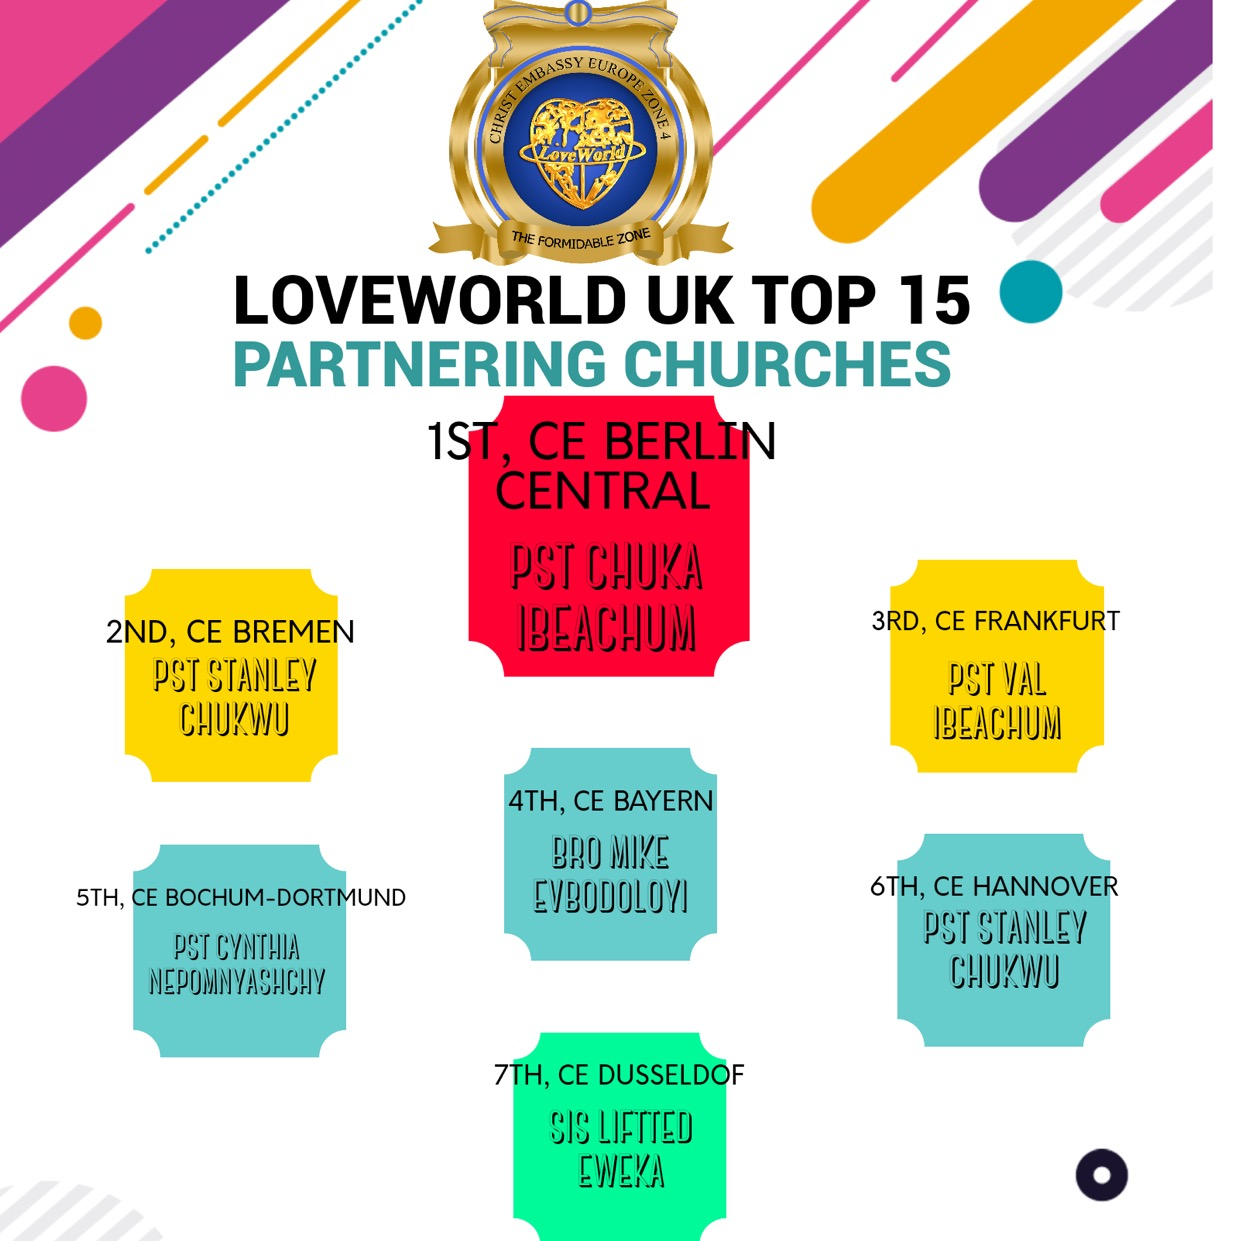 ZONAL AWARDS - LOVEWORLD UK